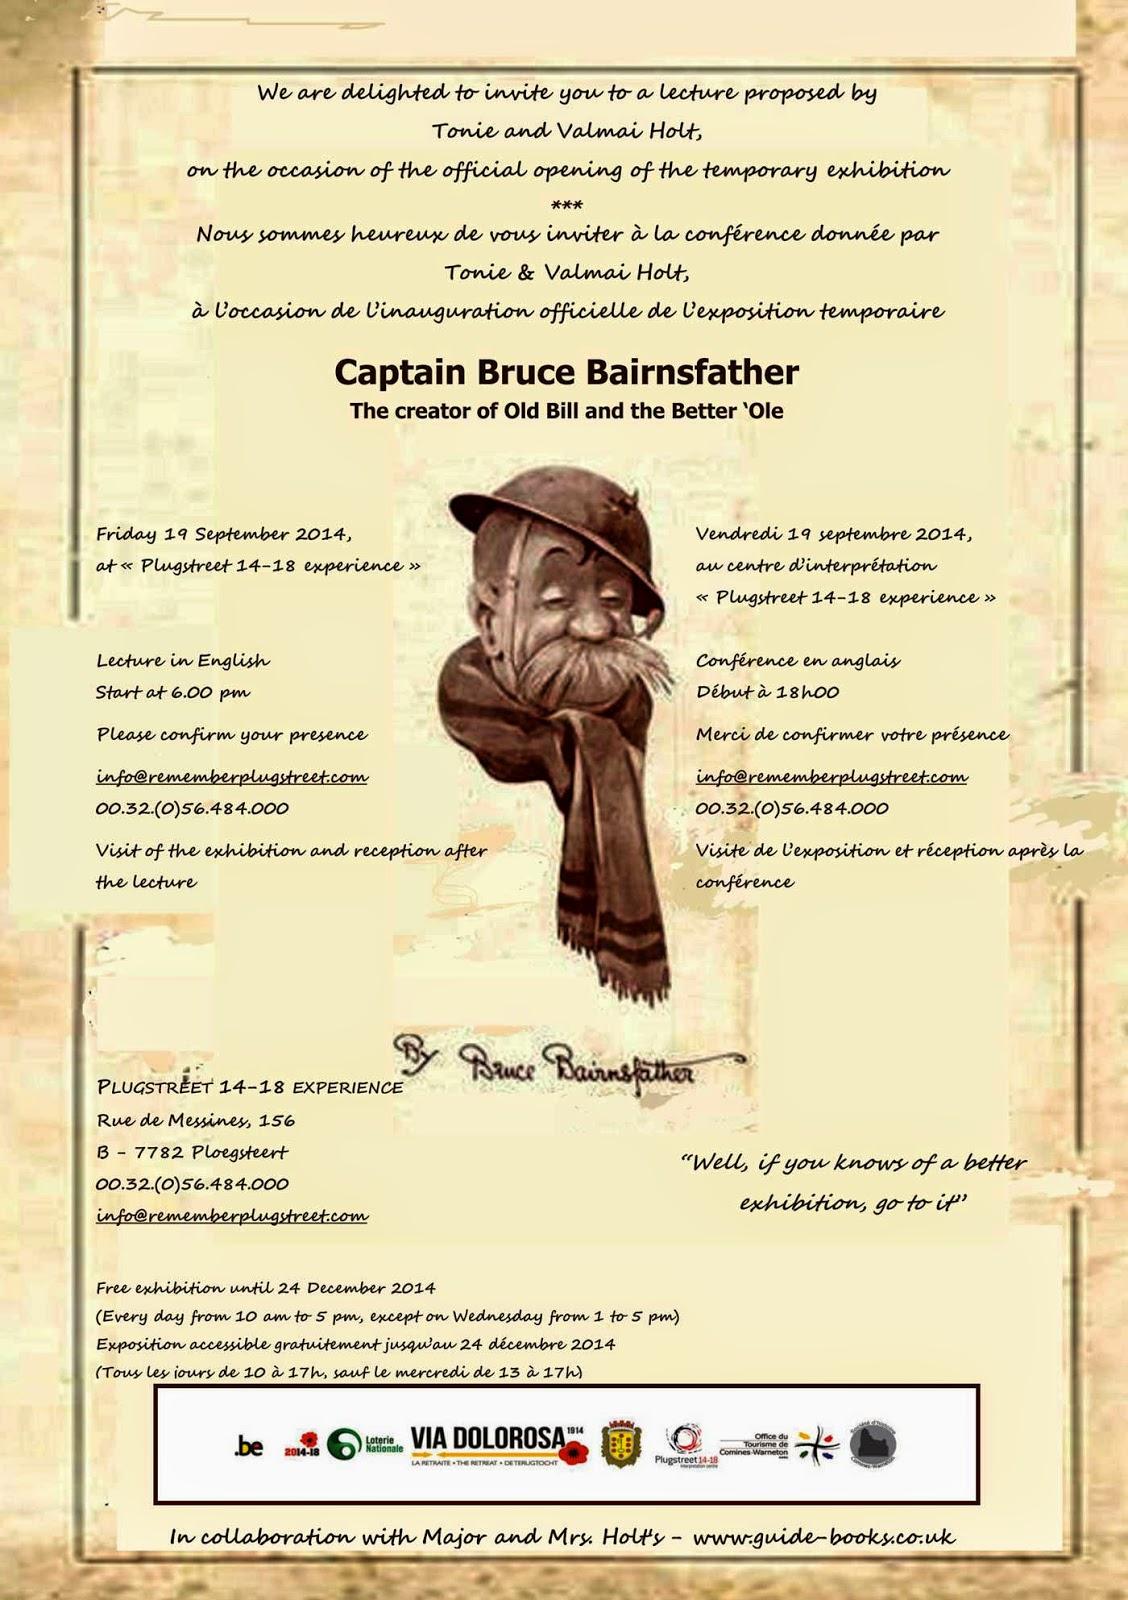 ECC Cartoonbooks Club: Captain Bruce Bairnsfather exhibition